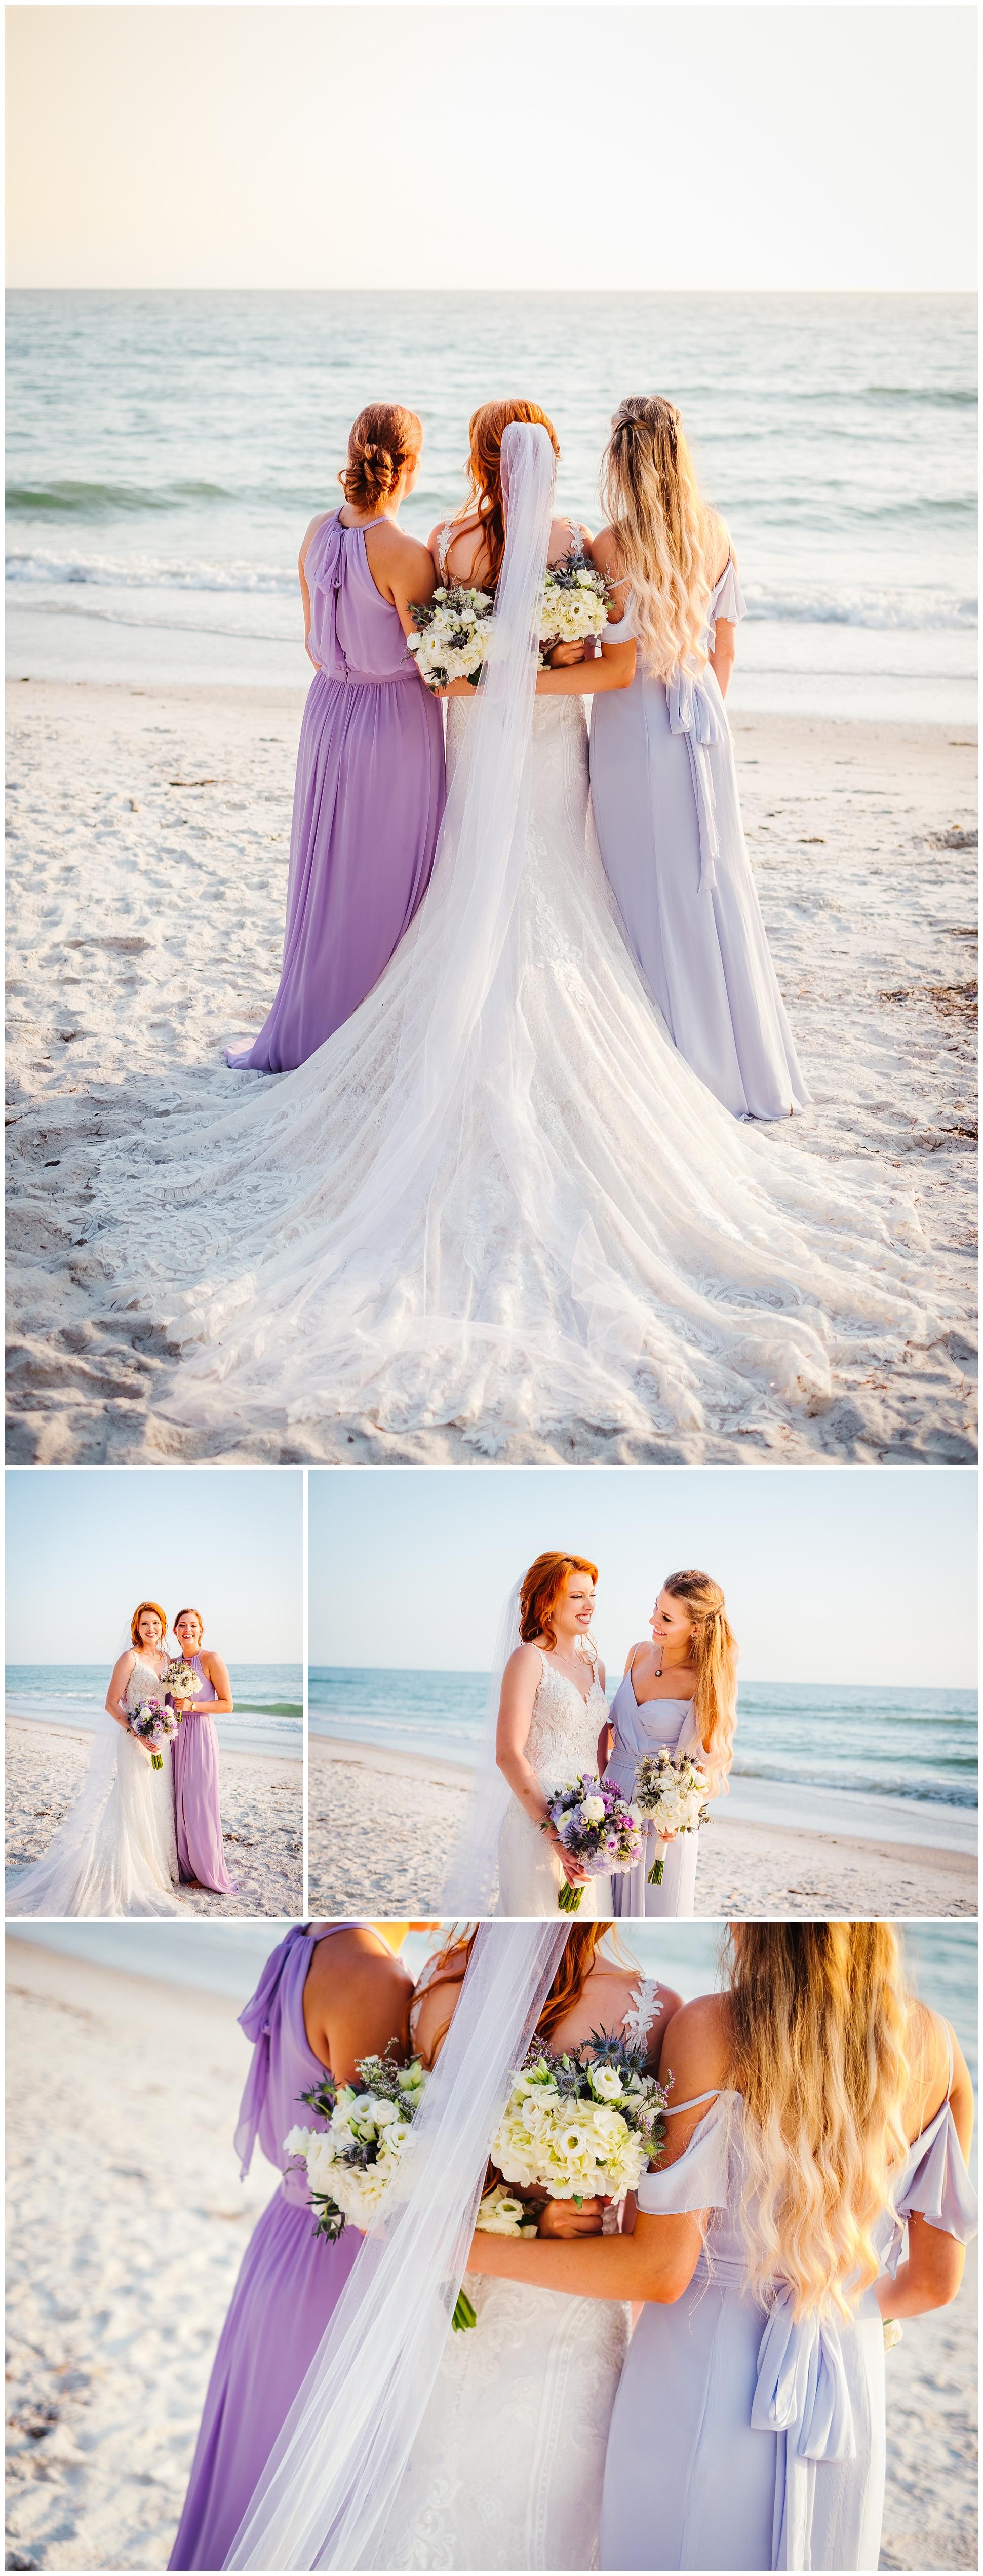 tampa-st-pete-wedding-photographer-indian-rocks-beach-mermaid-train-redhead_0149.jpg